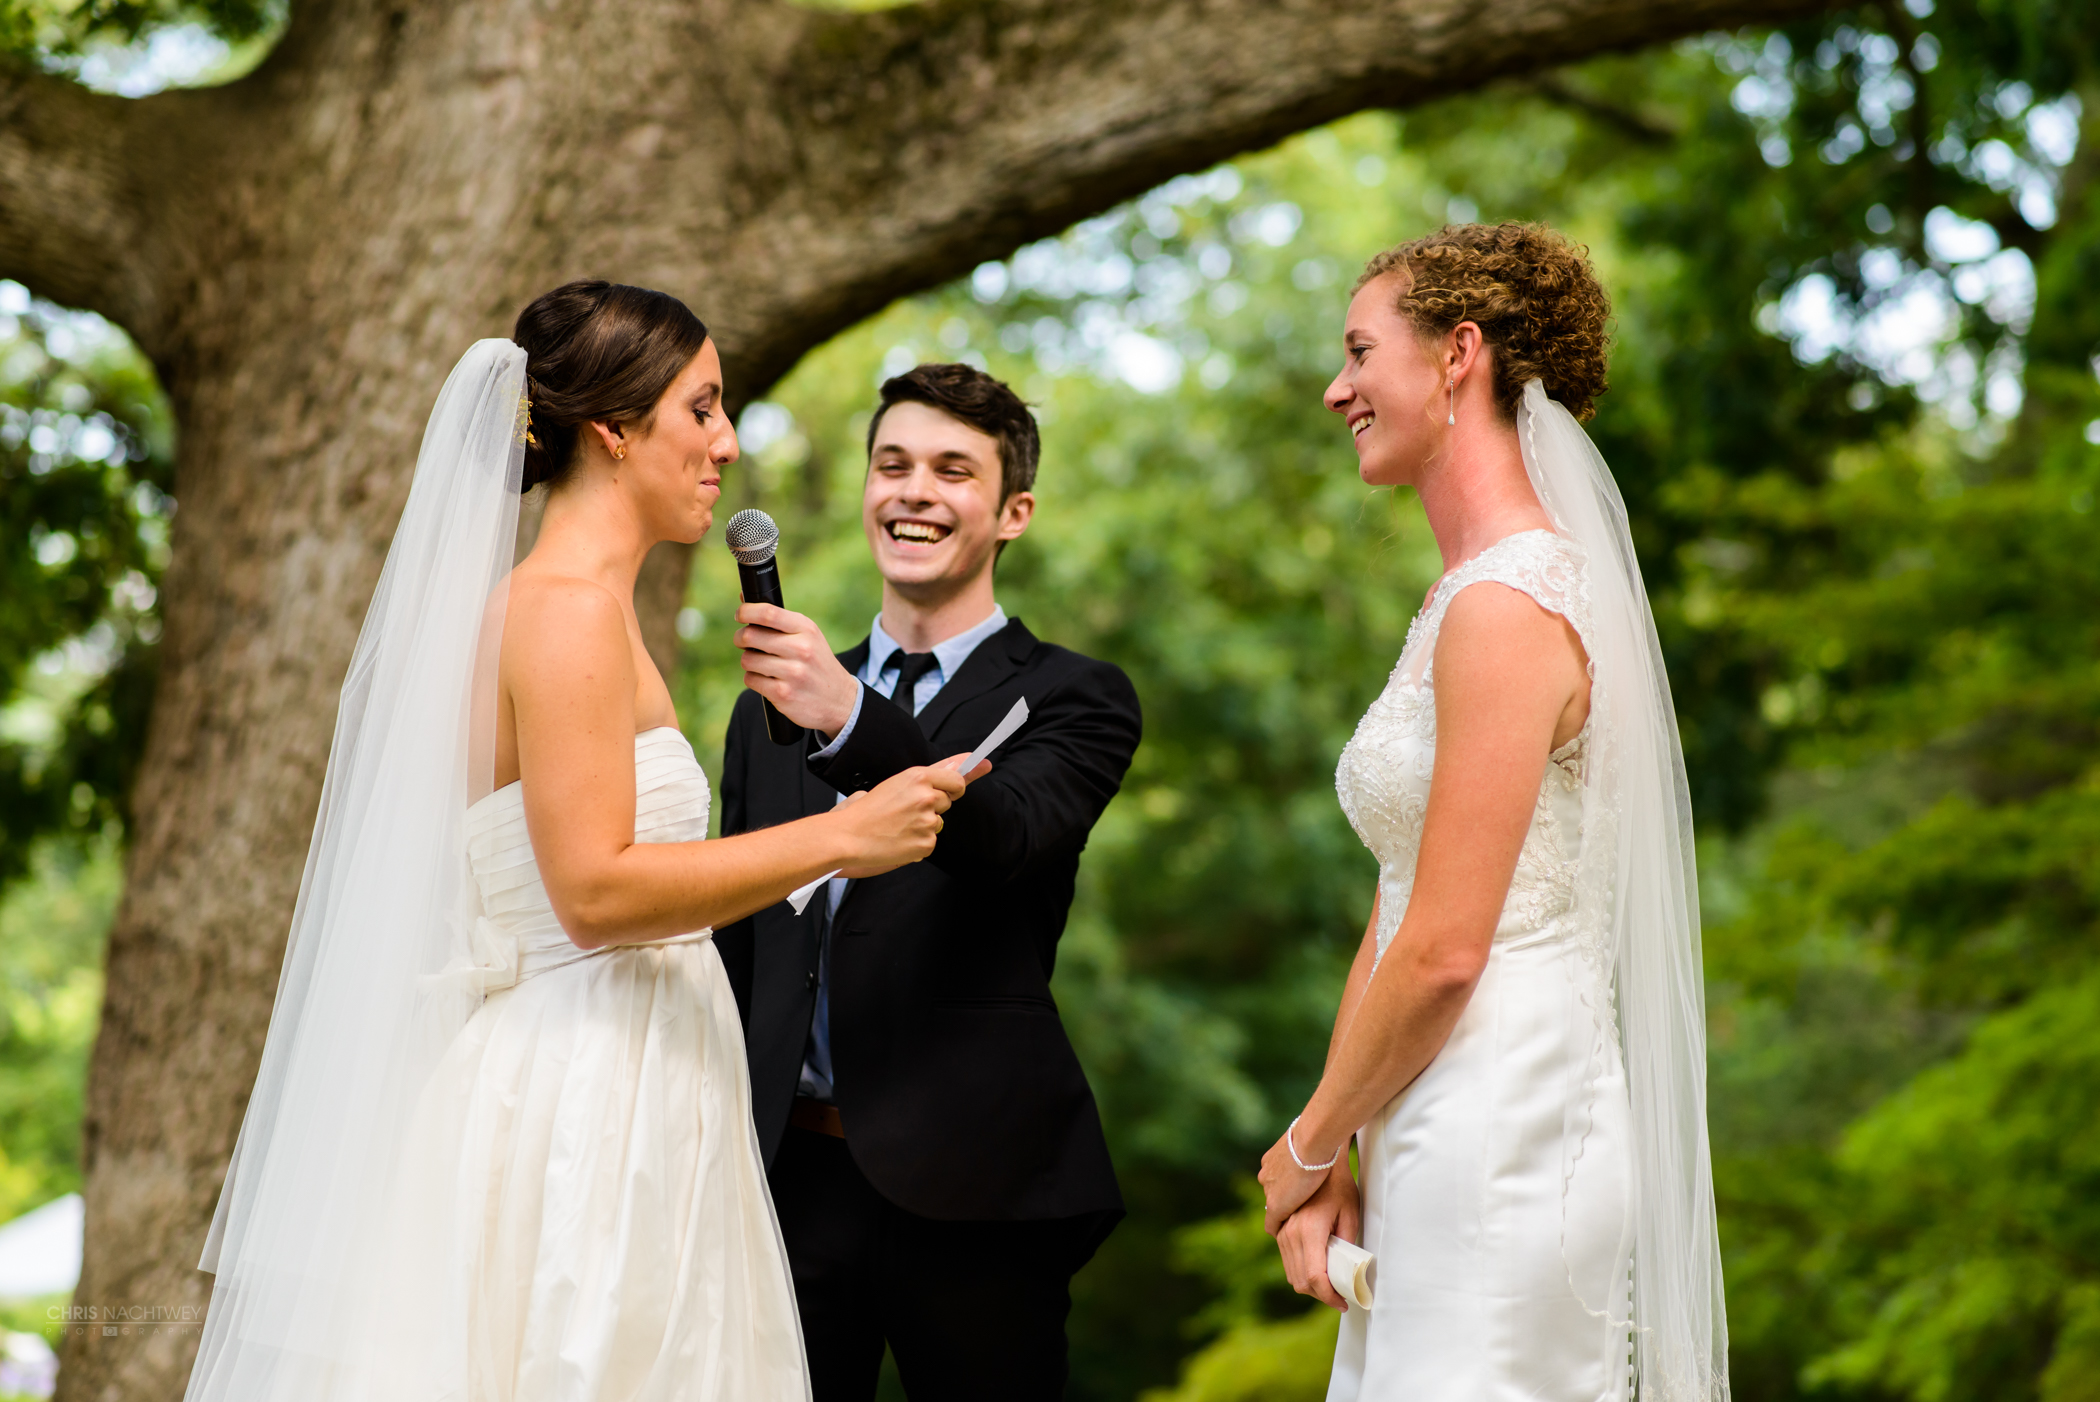 ct-same-sex-wedding-photographers-chris-nachtwey.jpg